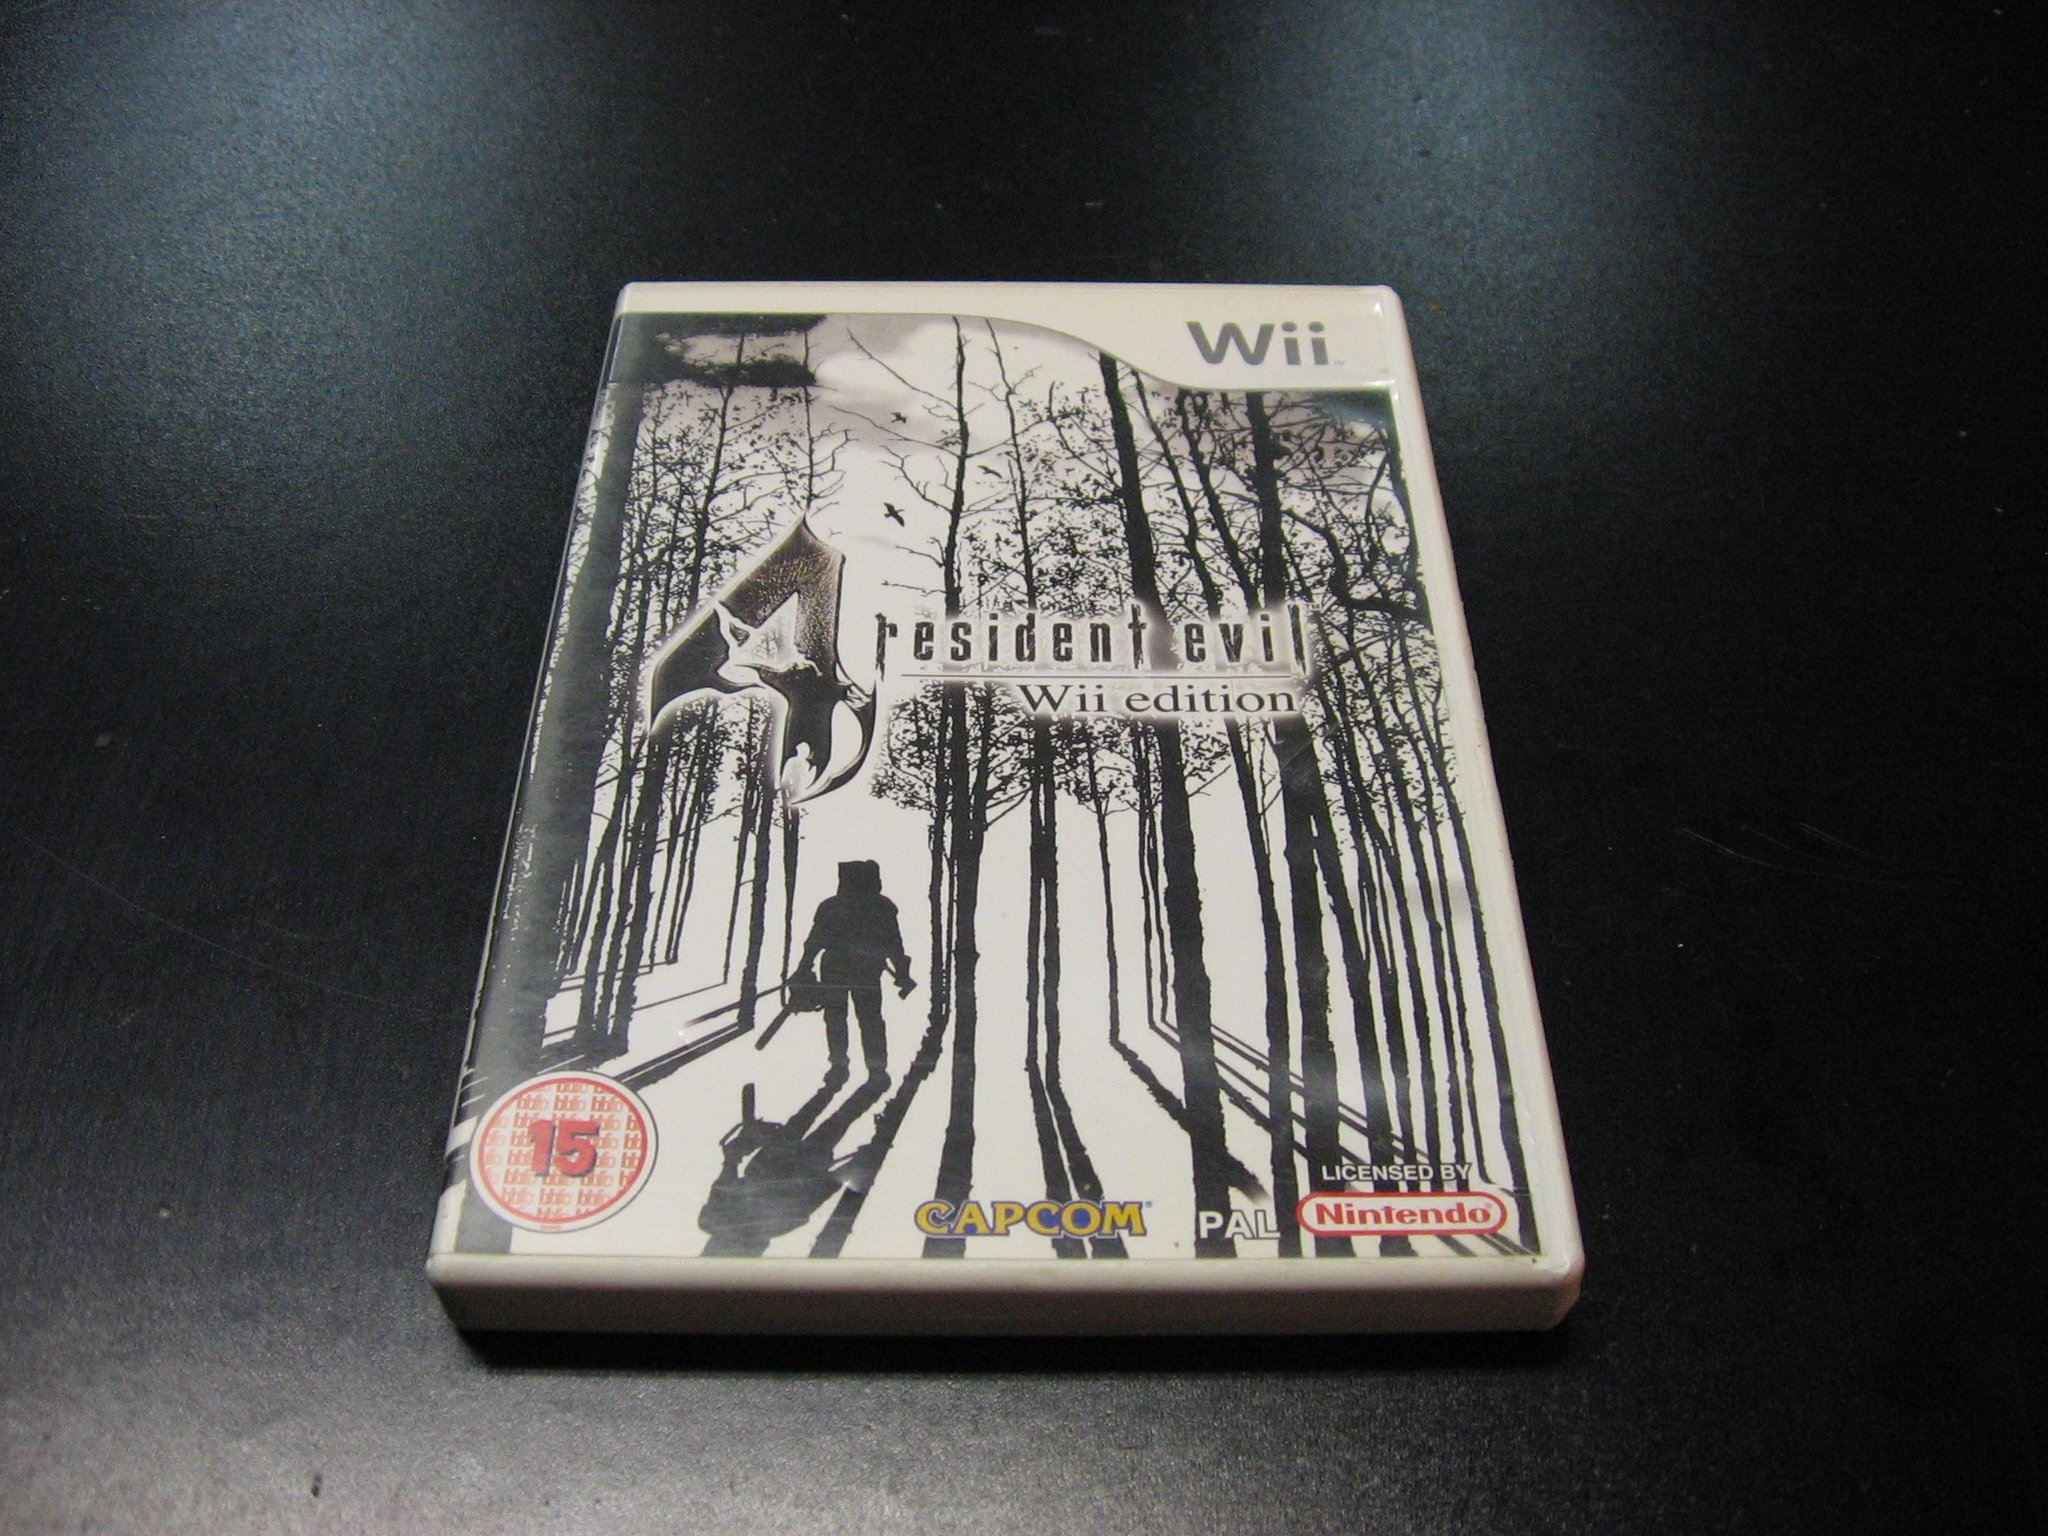 Resident Evil 4 Wii Edition - GRA Nintendo Wii Sklep